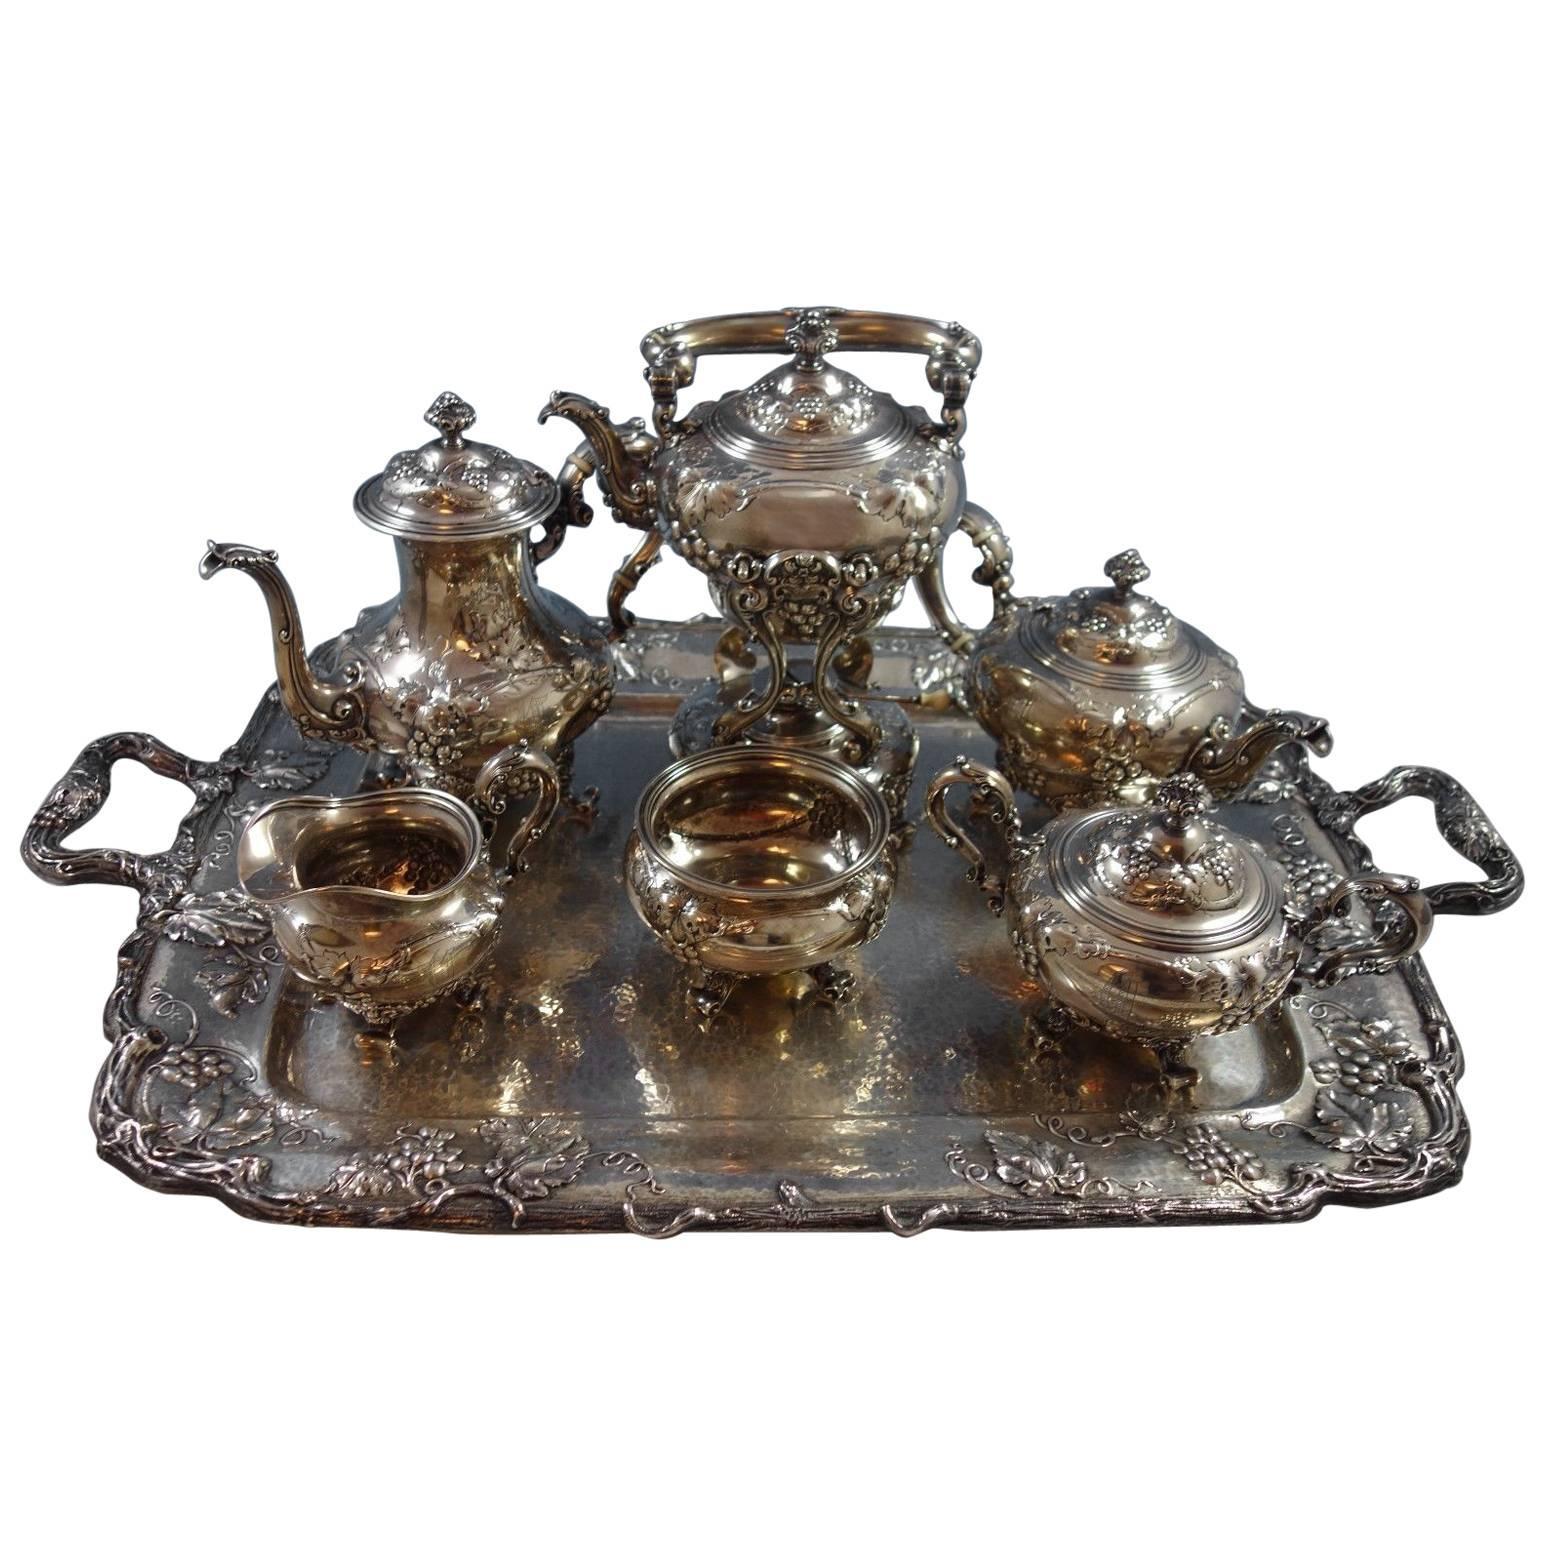 Modernic by Gorham Sterling Silver 6-Piece Tea Set Tray, Grapes 1818B